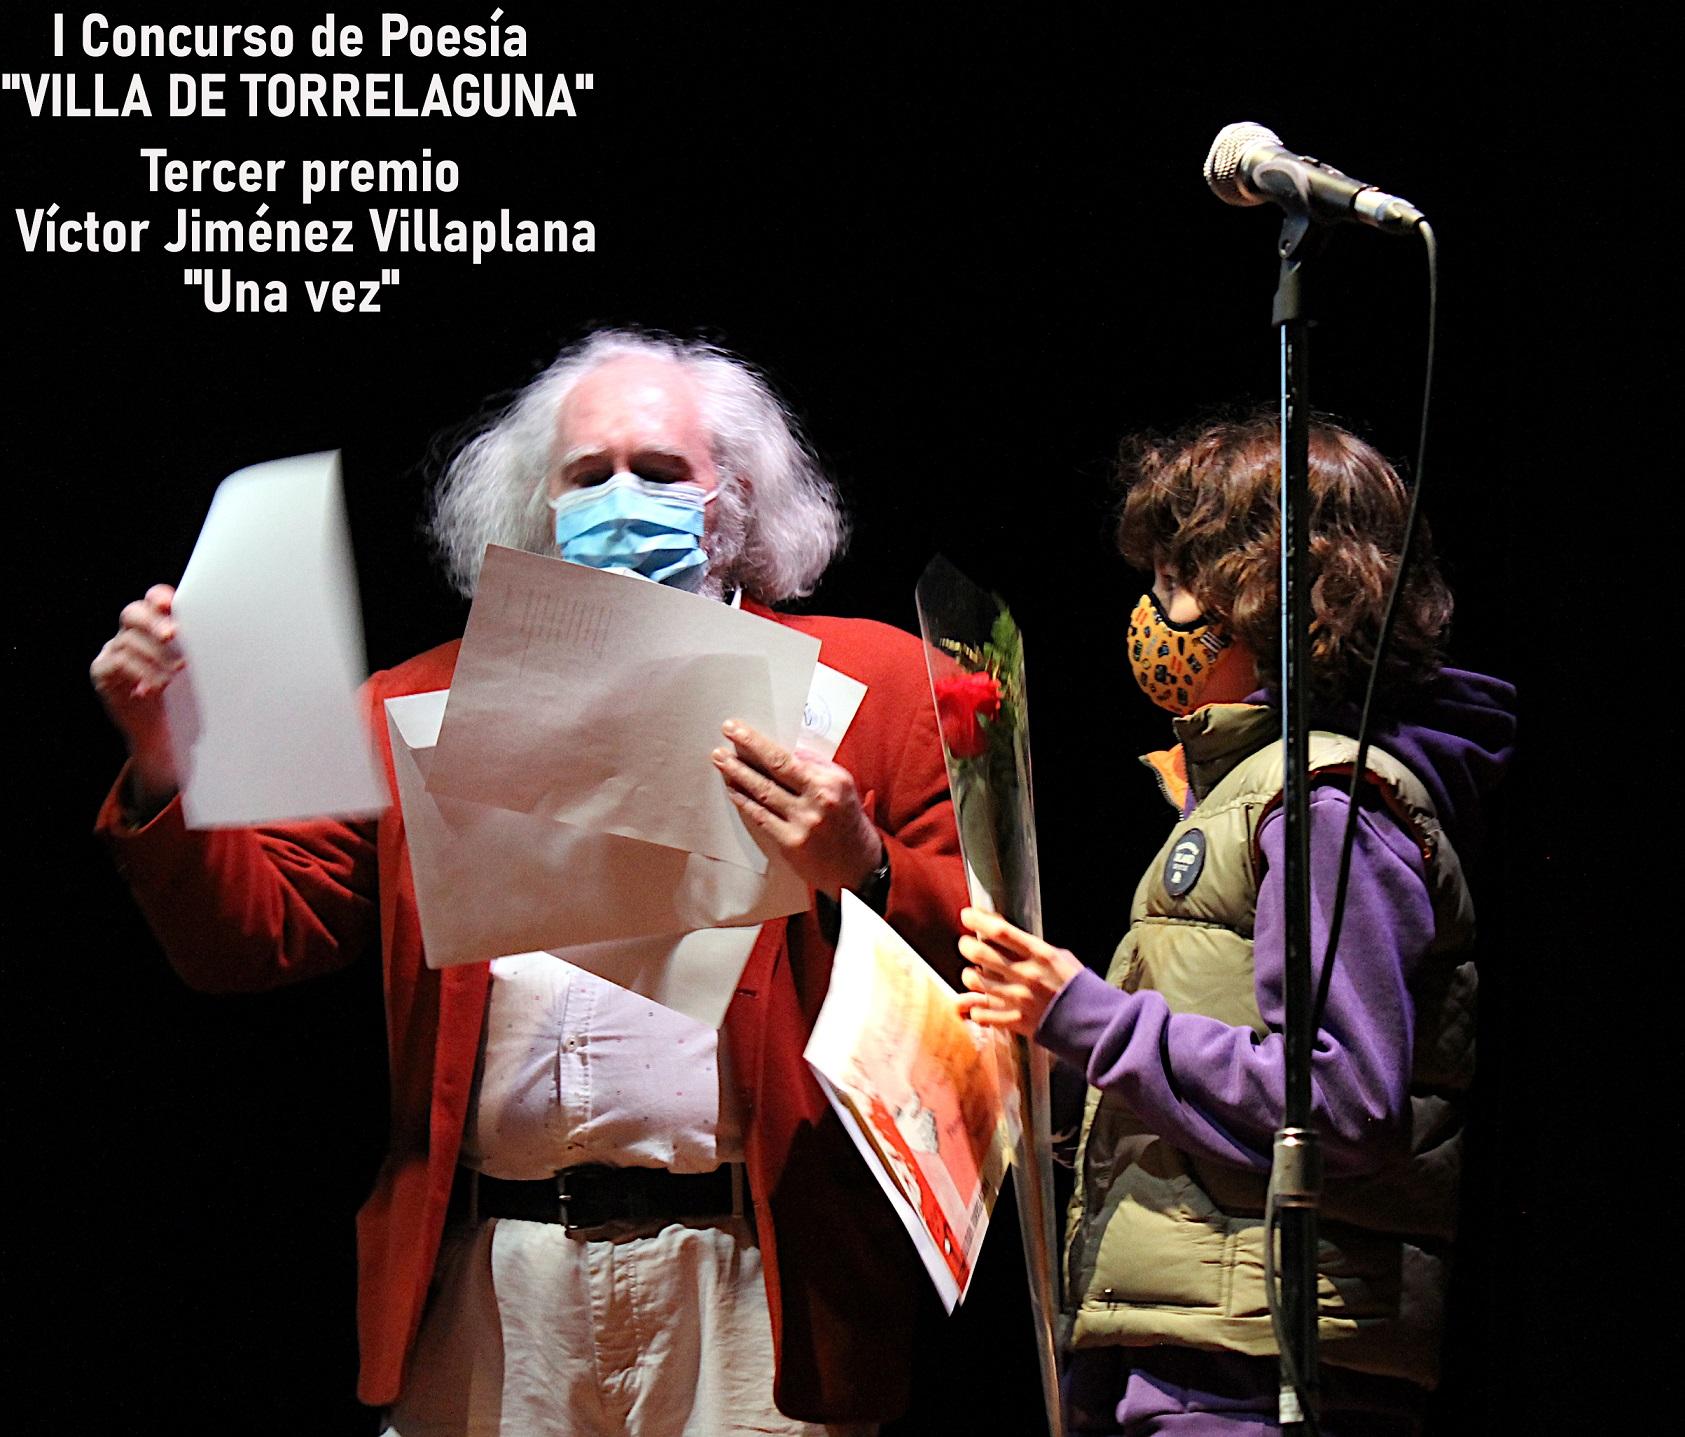 Tercer premio Víctor Jiménez Villaplana